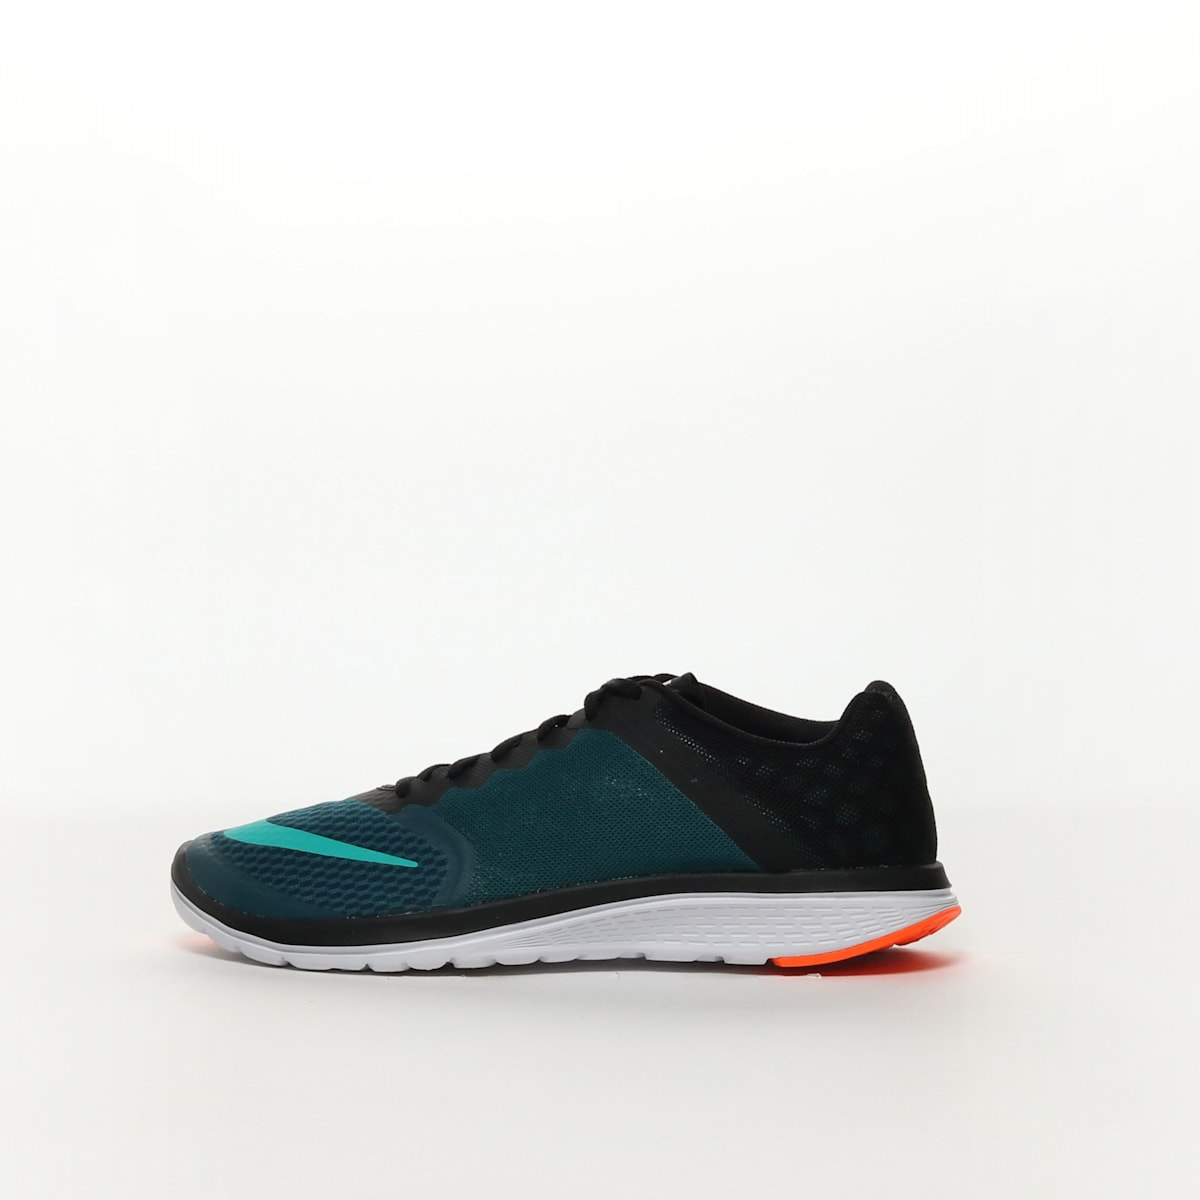 0ed7146b271 Men s Nike FS Lite Run 3 Running Shoe - MIDNIGHT TURQ CLEAR JADE ...